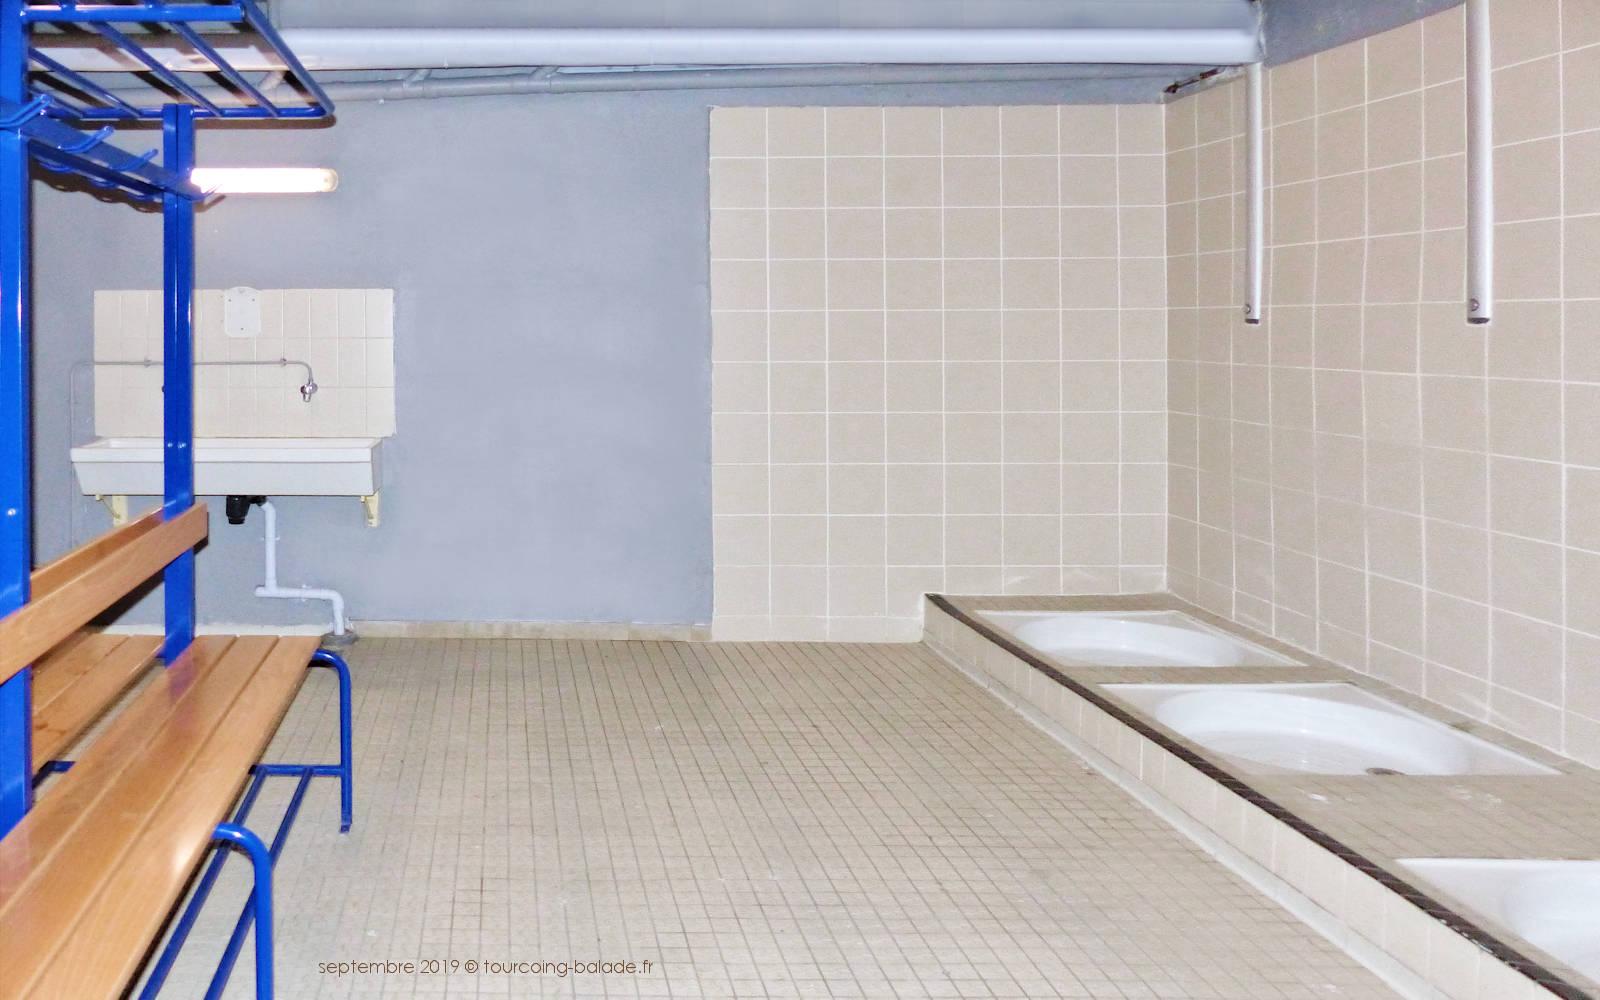 Complexe Sportif Lagrange Tourcoing - Douches